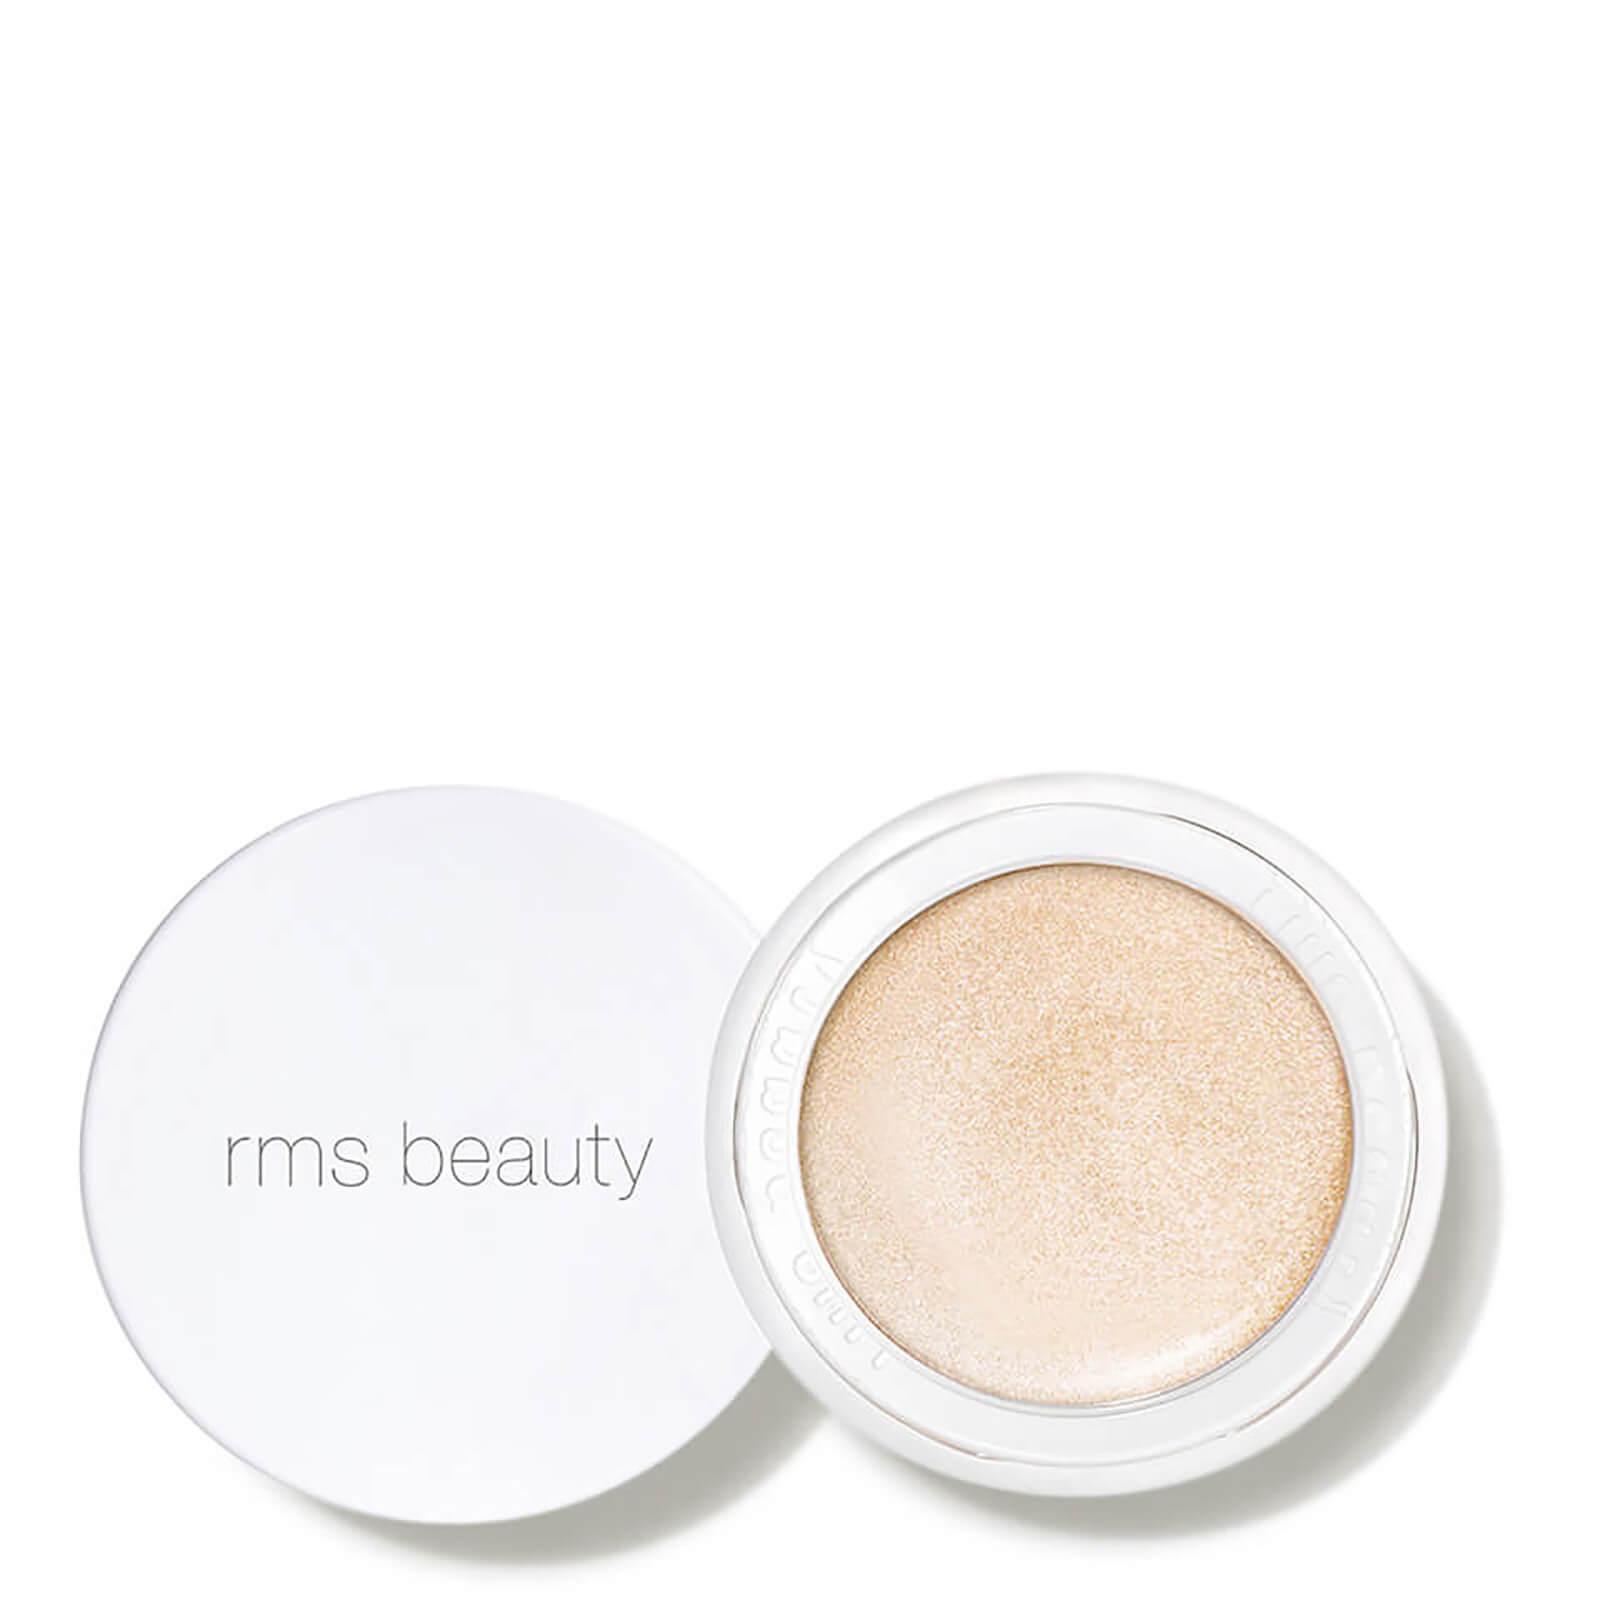 Купить RMS Beauty Eye Polish - Lunar